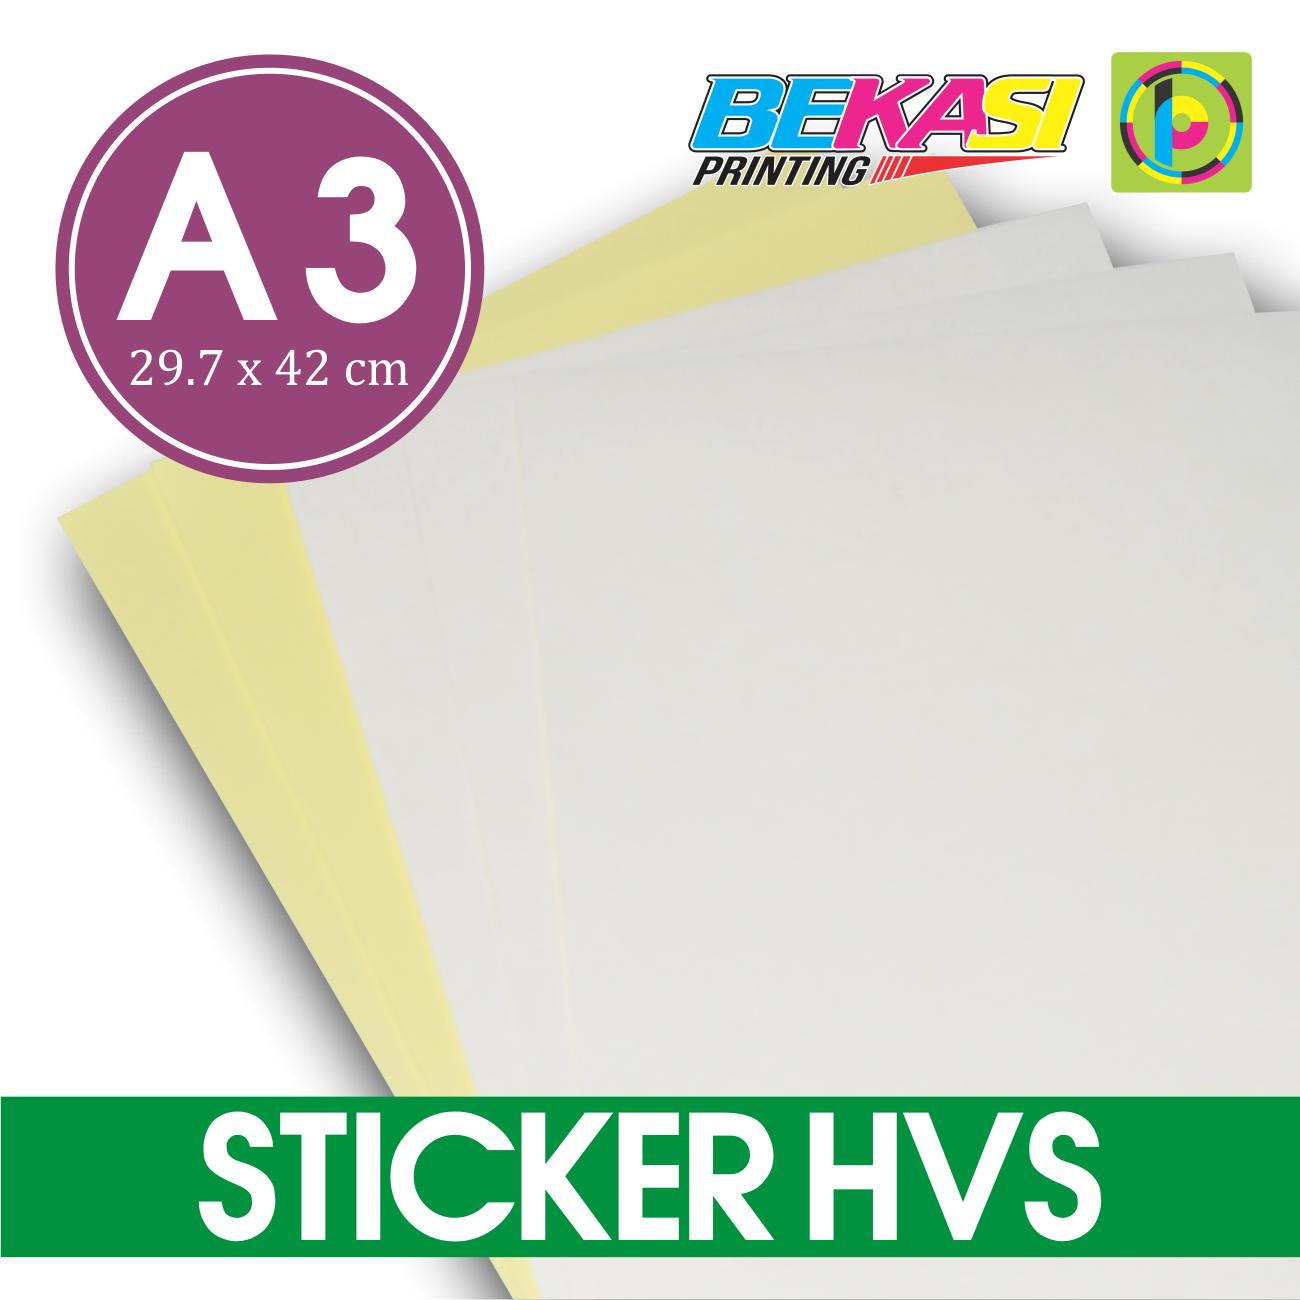 Jual kertas stiker hvs a3 printable sticker bisa di print kota